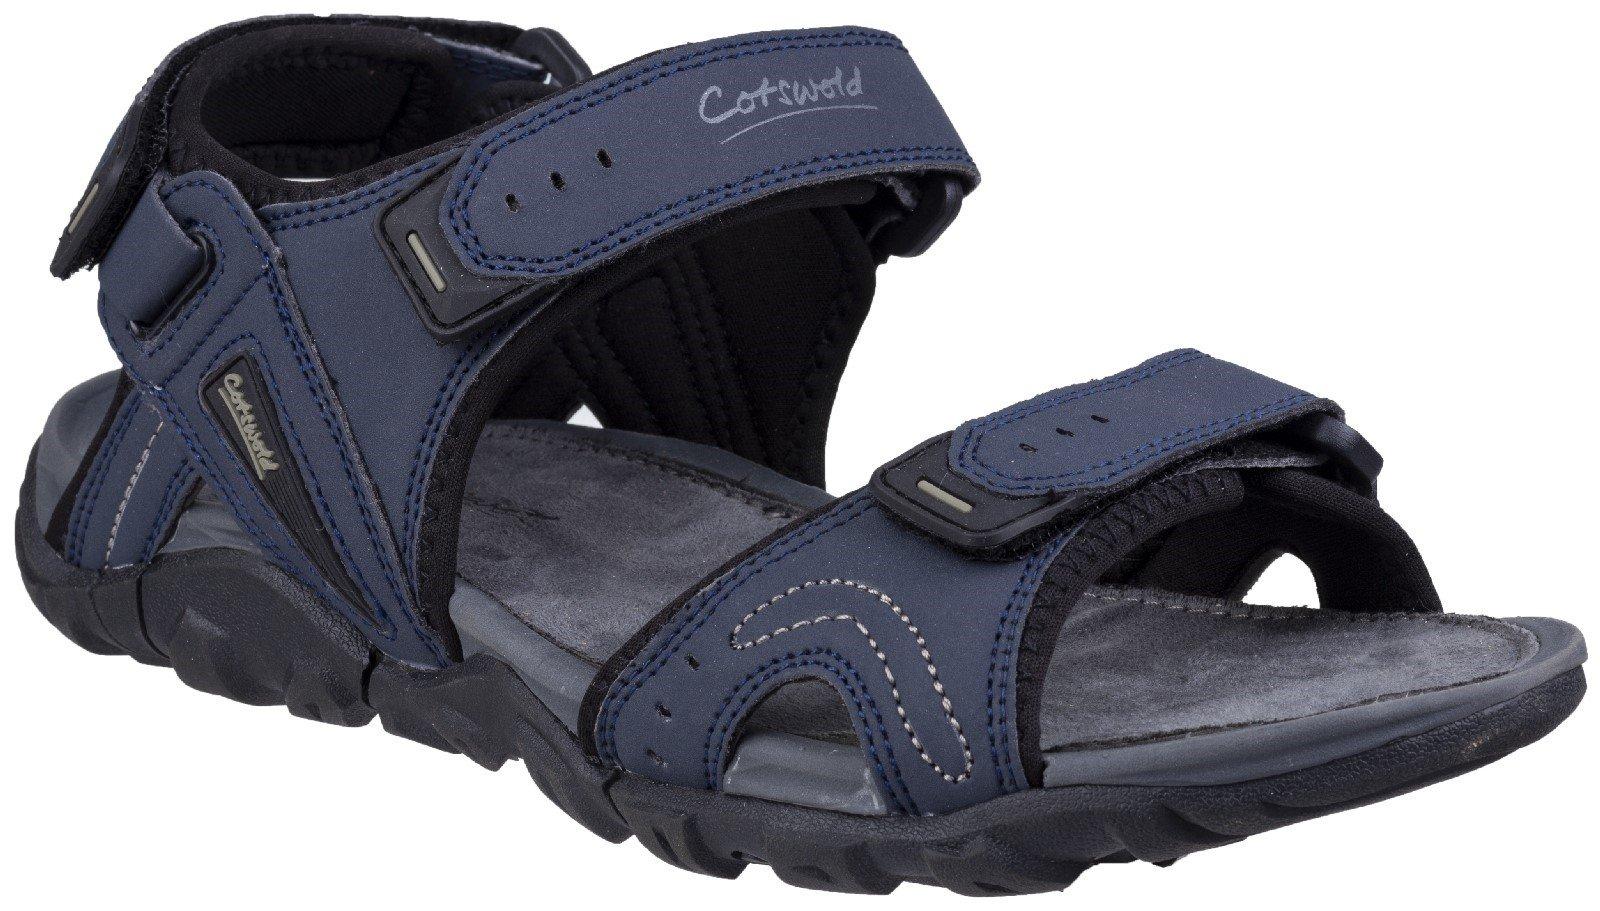 Cotswold Men's Rodmarton Touch Fasten Walking Sandal Various Colours 28243 - Navy/Grey 7